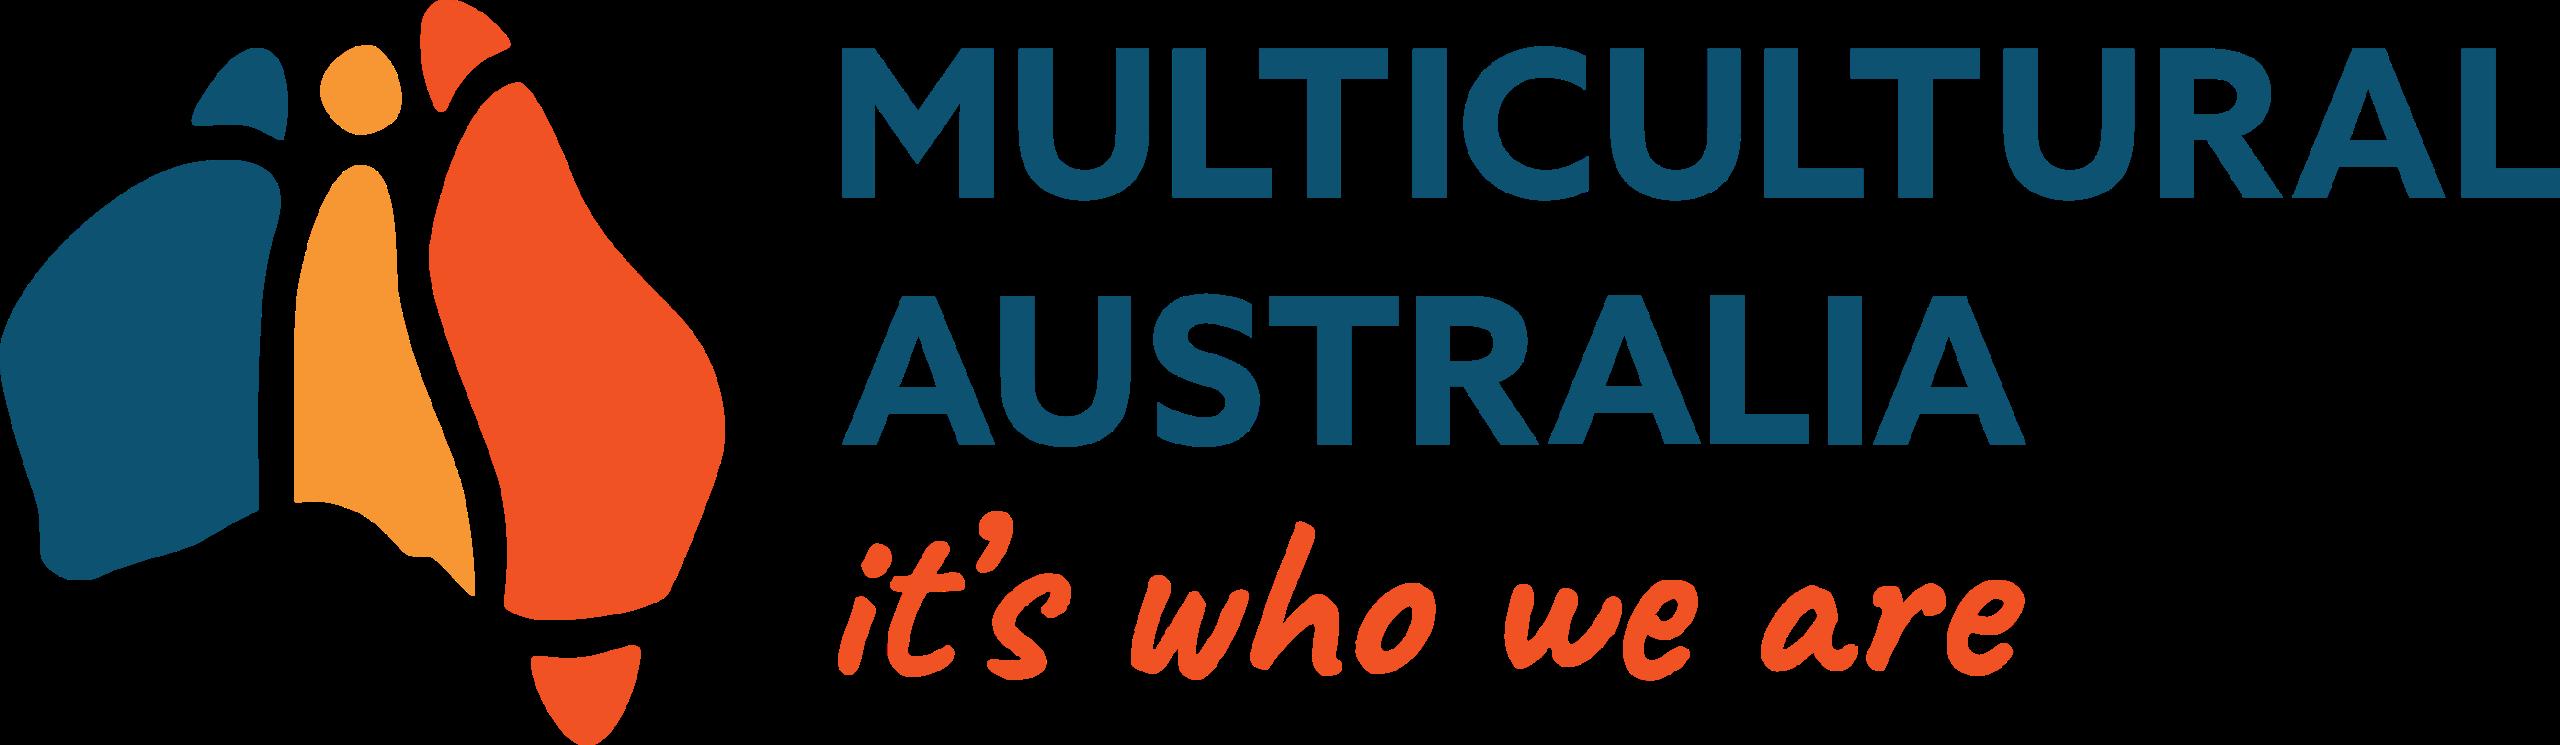 Logo showing map of Australia